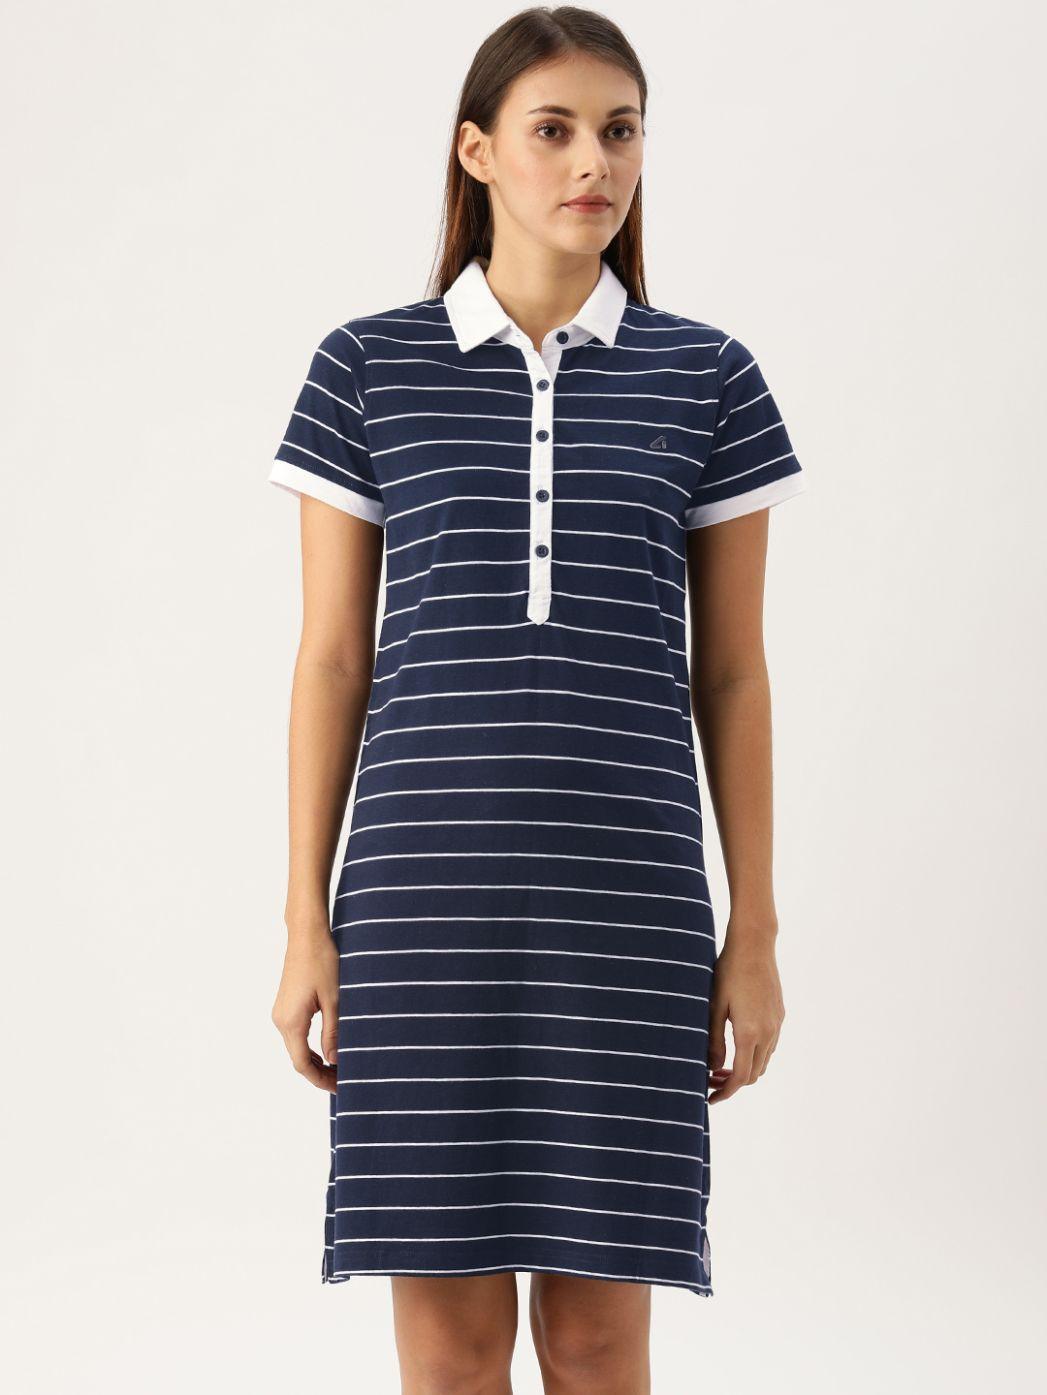 Mariner Navy / White Polo Dress